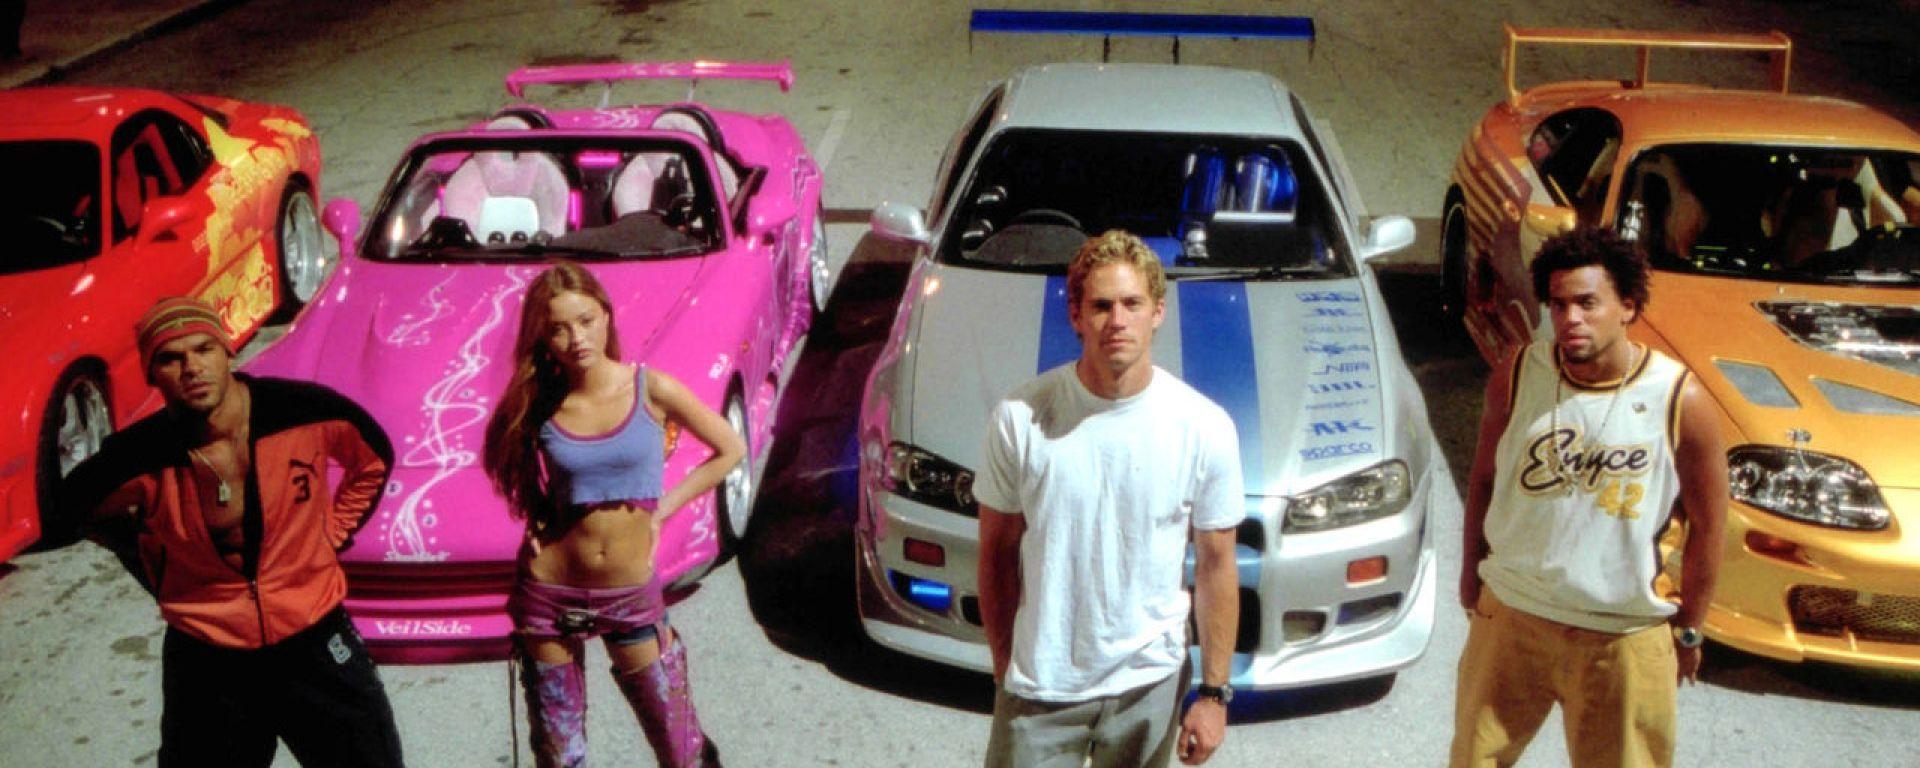 2 Fast 2 Furious, un video svela tutti i segreti di una scena mitica